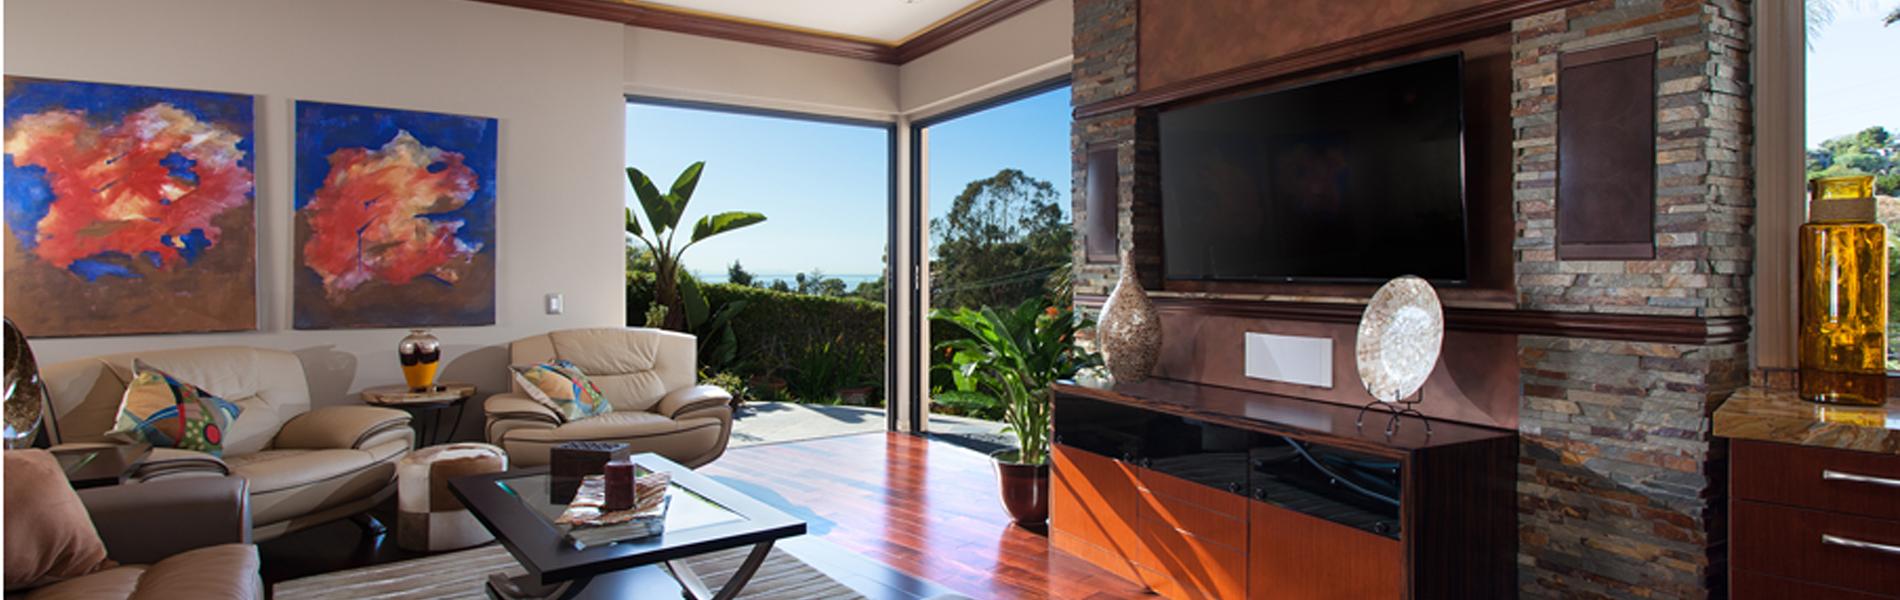 home design intervention laguna beach california